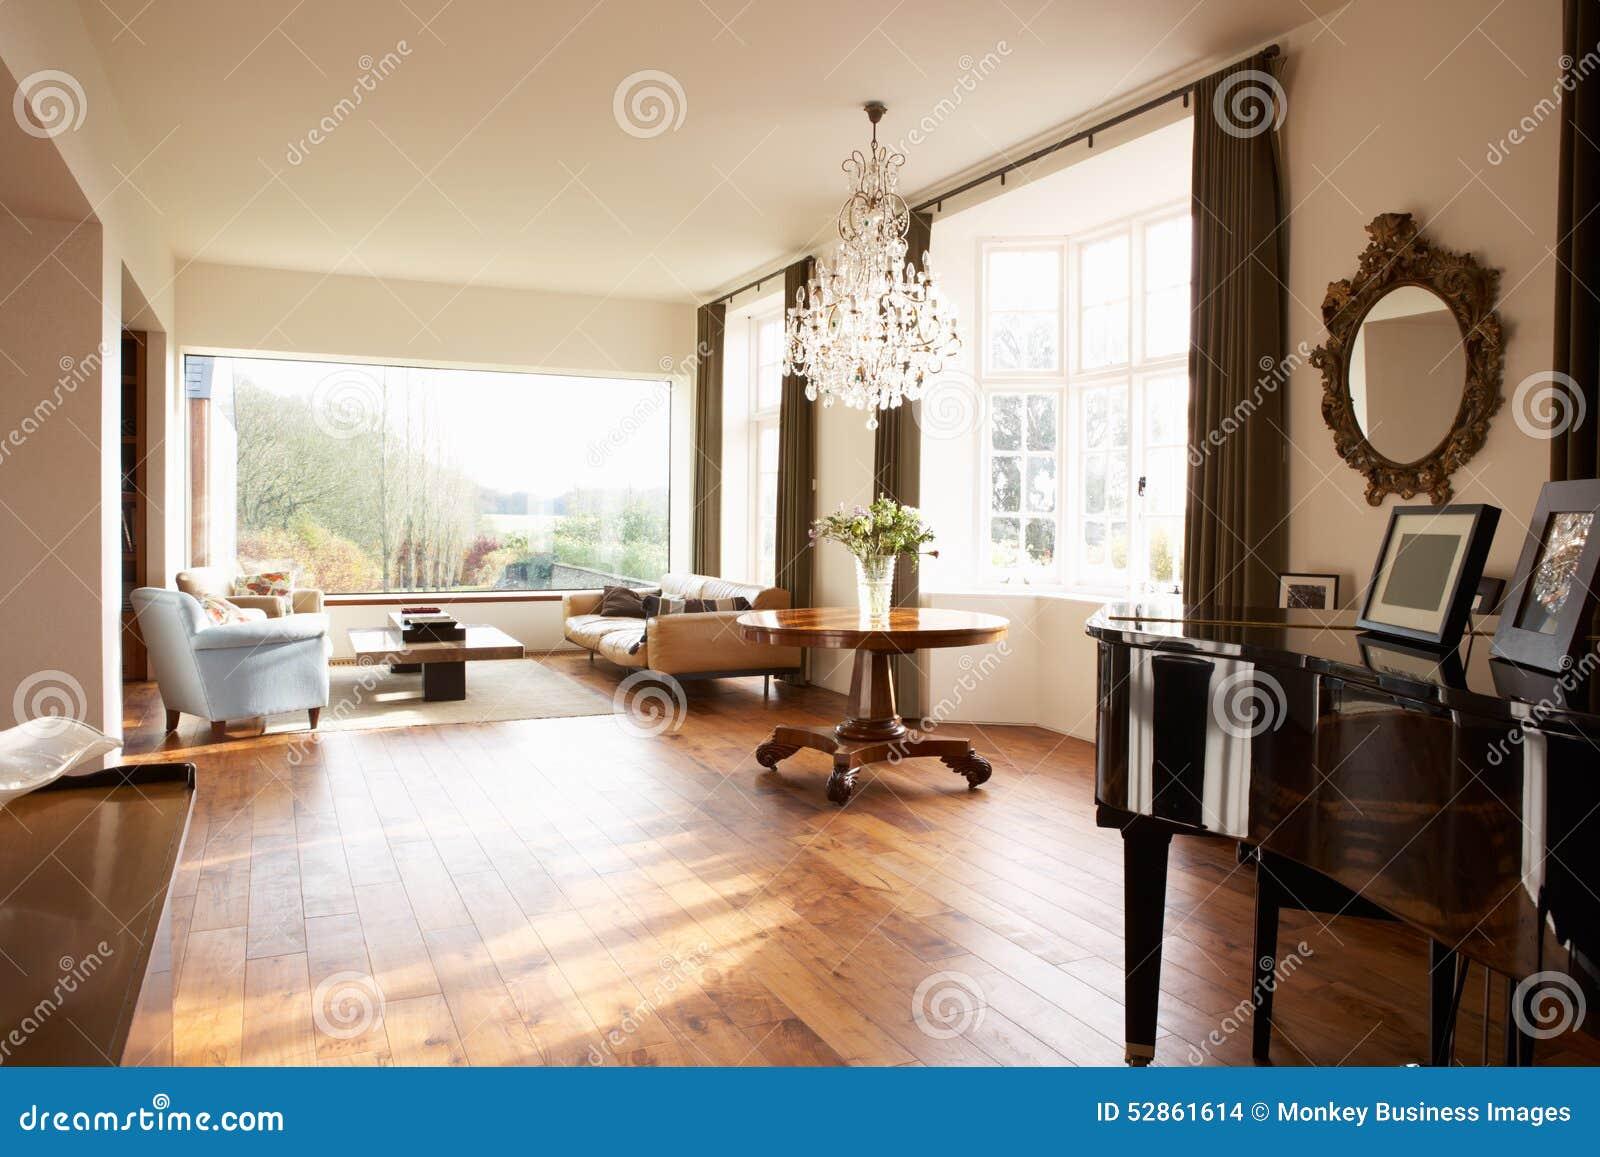 Beautiful Interior Design In Dining Room Of Ship Royalty Free Stock Photography Cartoondealer